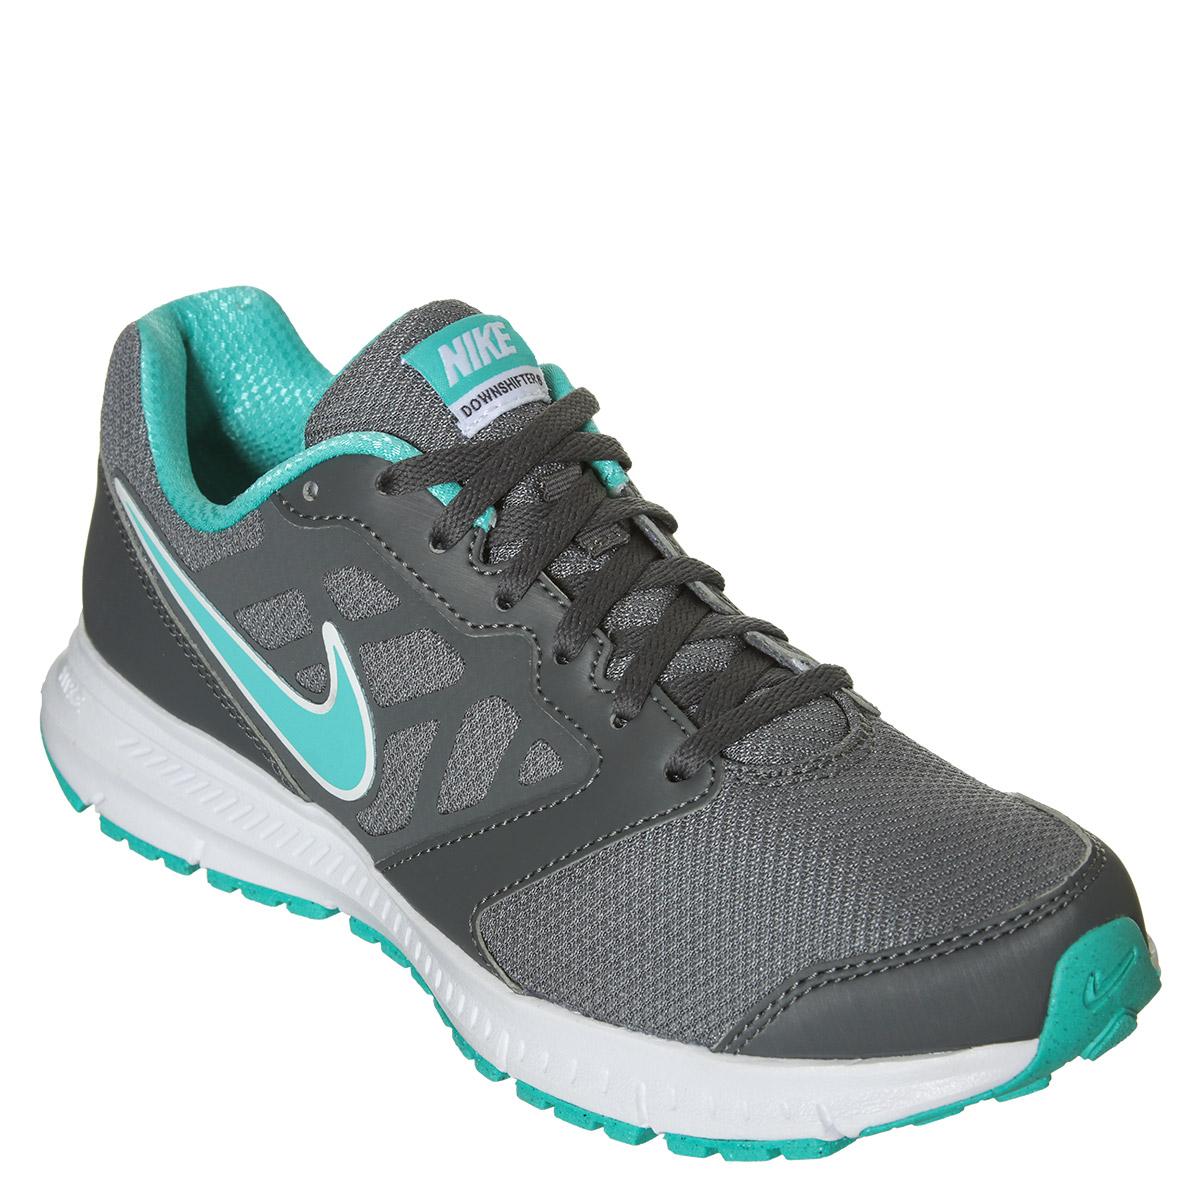 Nike Verdes